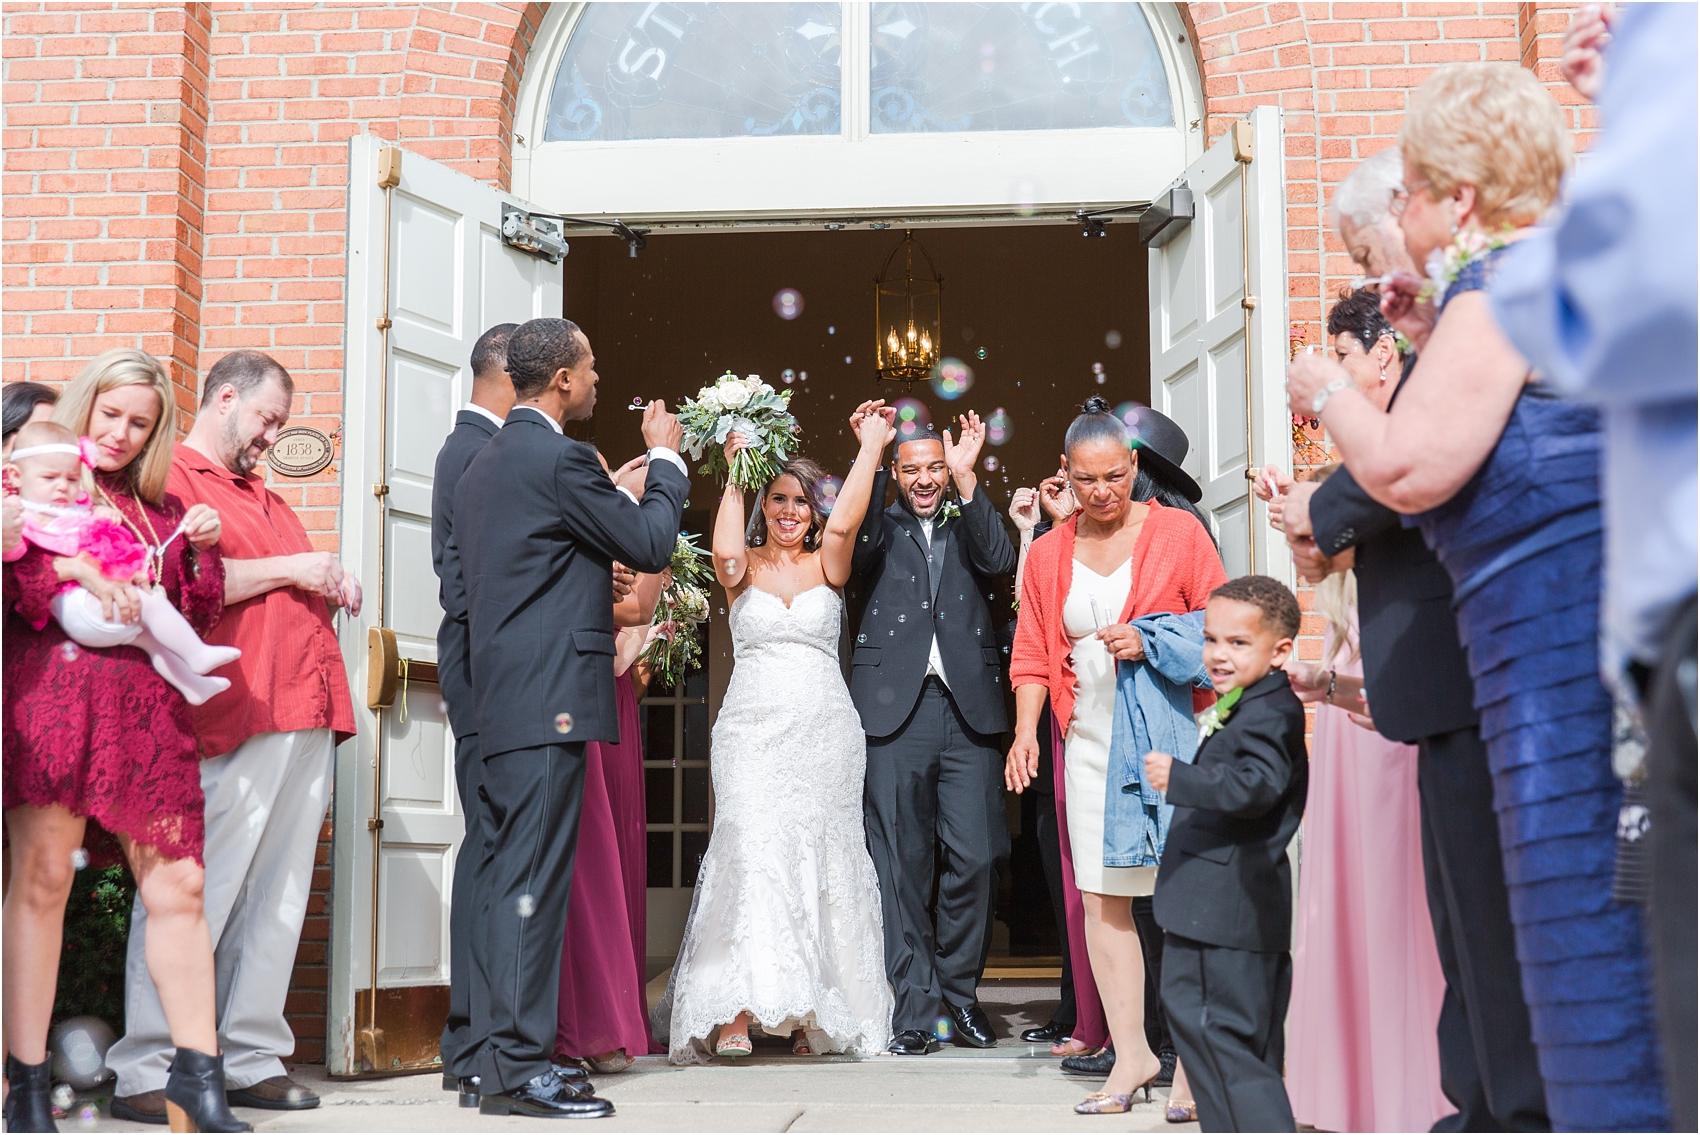 elegant-and-romantic-fall-wedding-photos-at-st-marys-catholic-church-in-monroe-michigan-by-courtney-carolyn-photography_0030.jpg